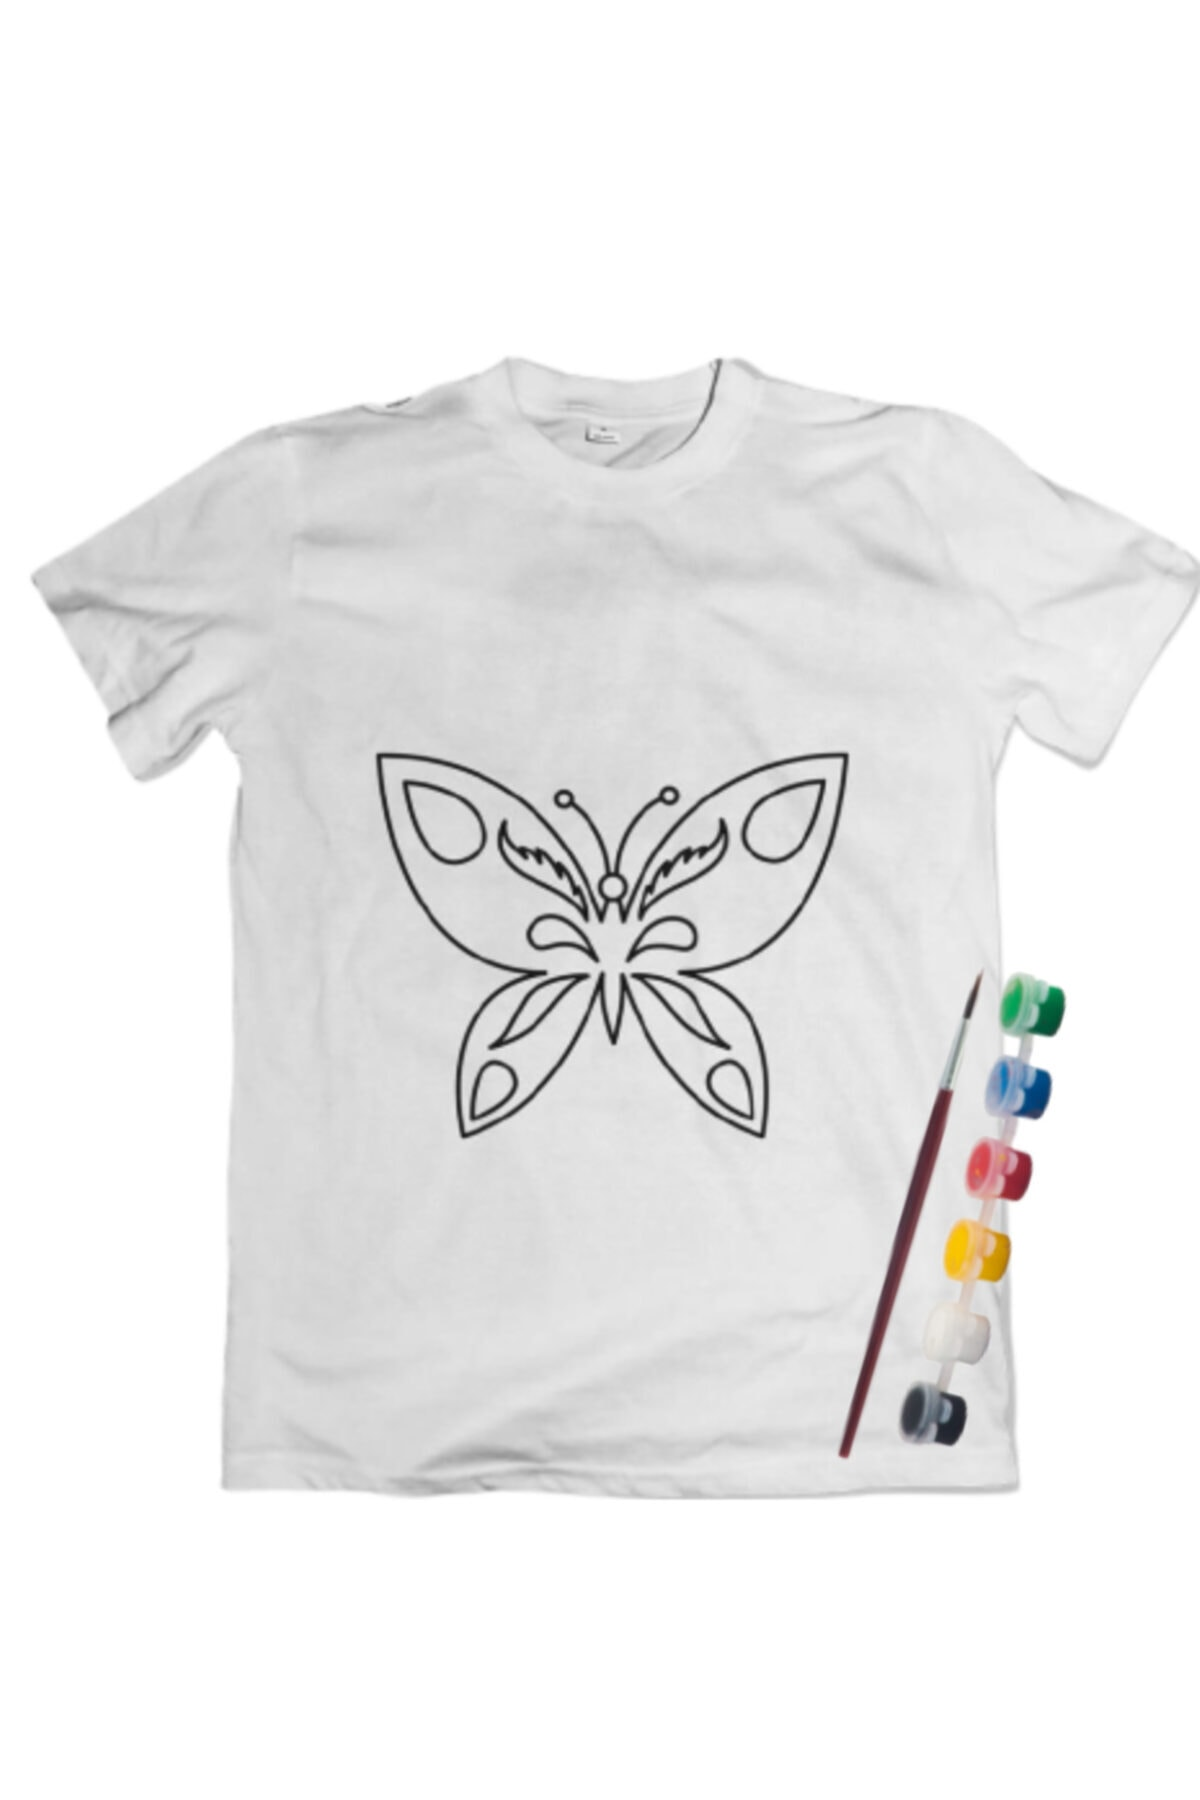 Joy and Toys Kelebek Desenli T-shirt Boyama Seti 4-5 Yaş Çocuk Aktivite 1